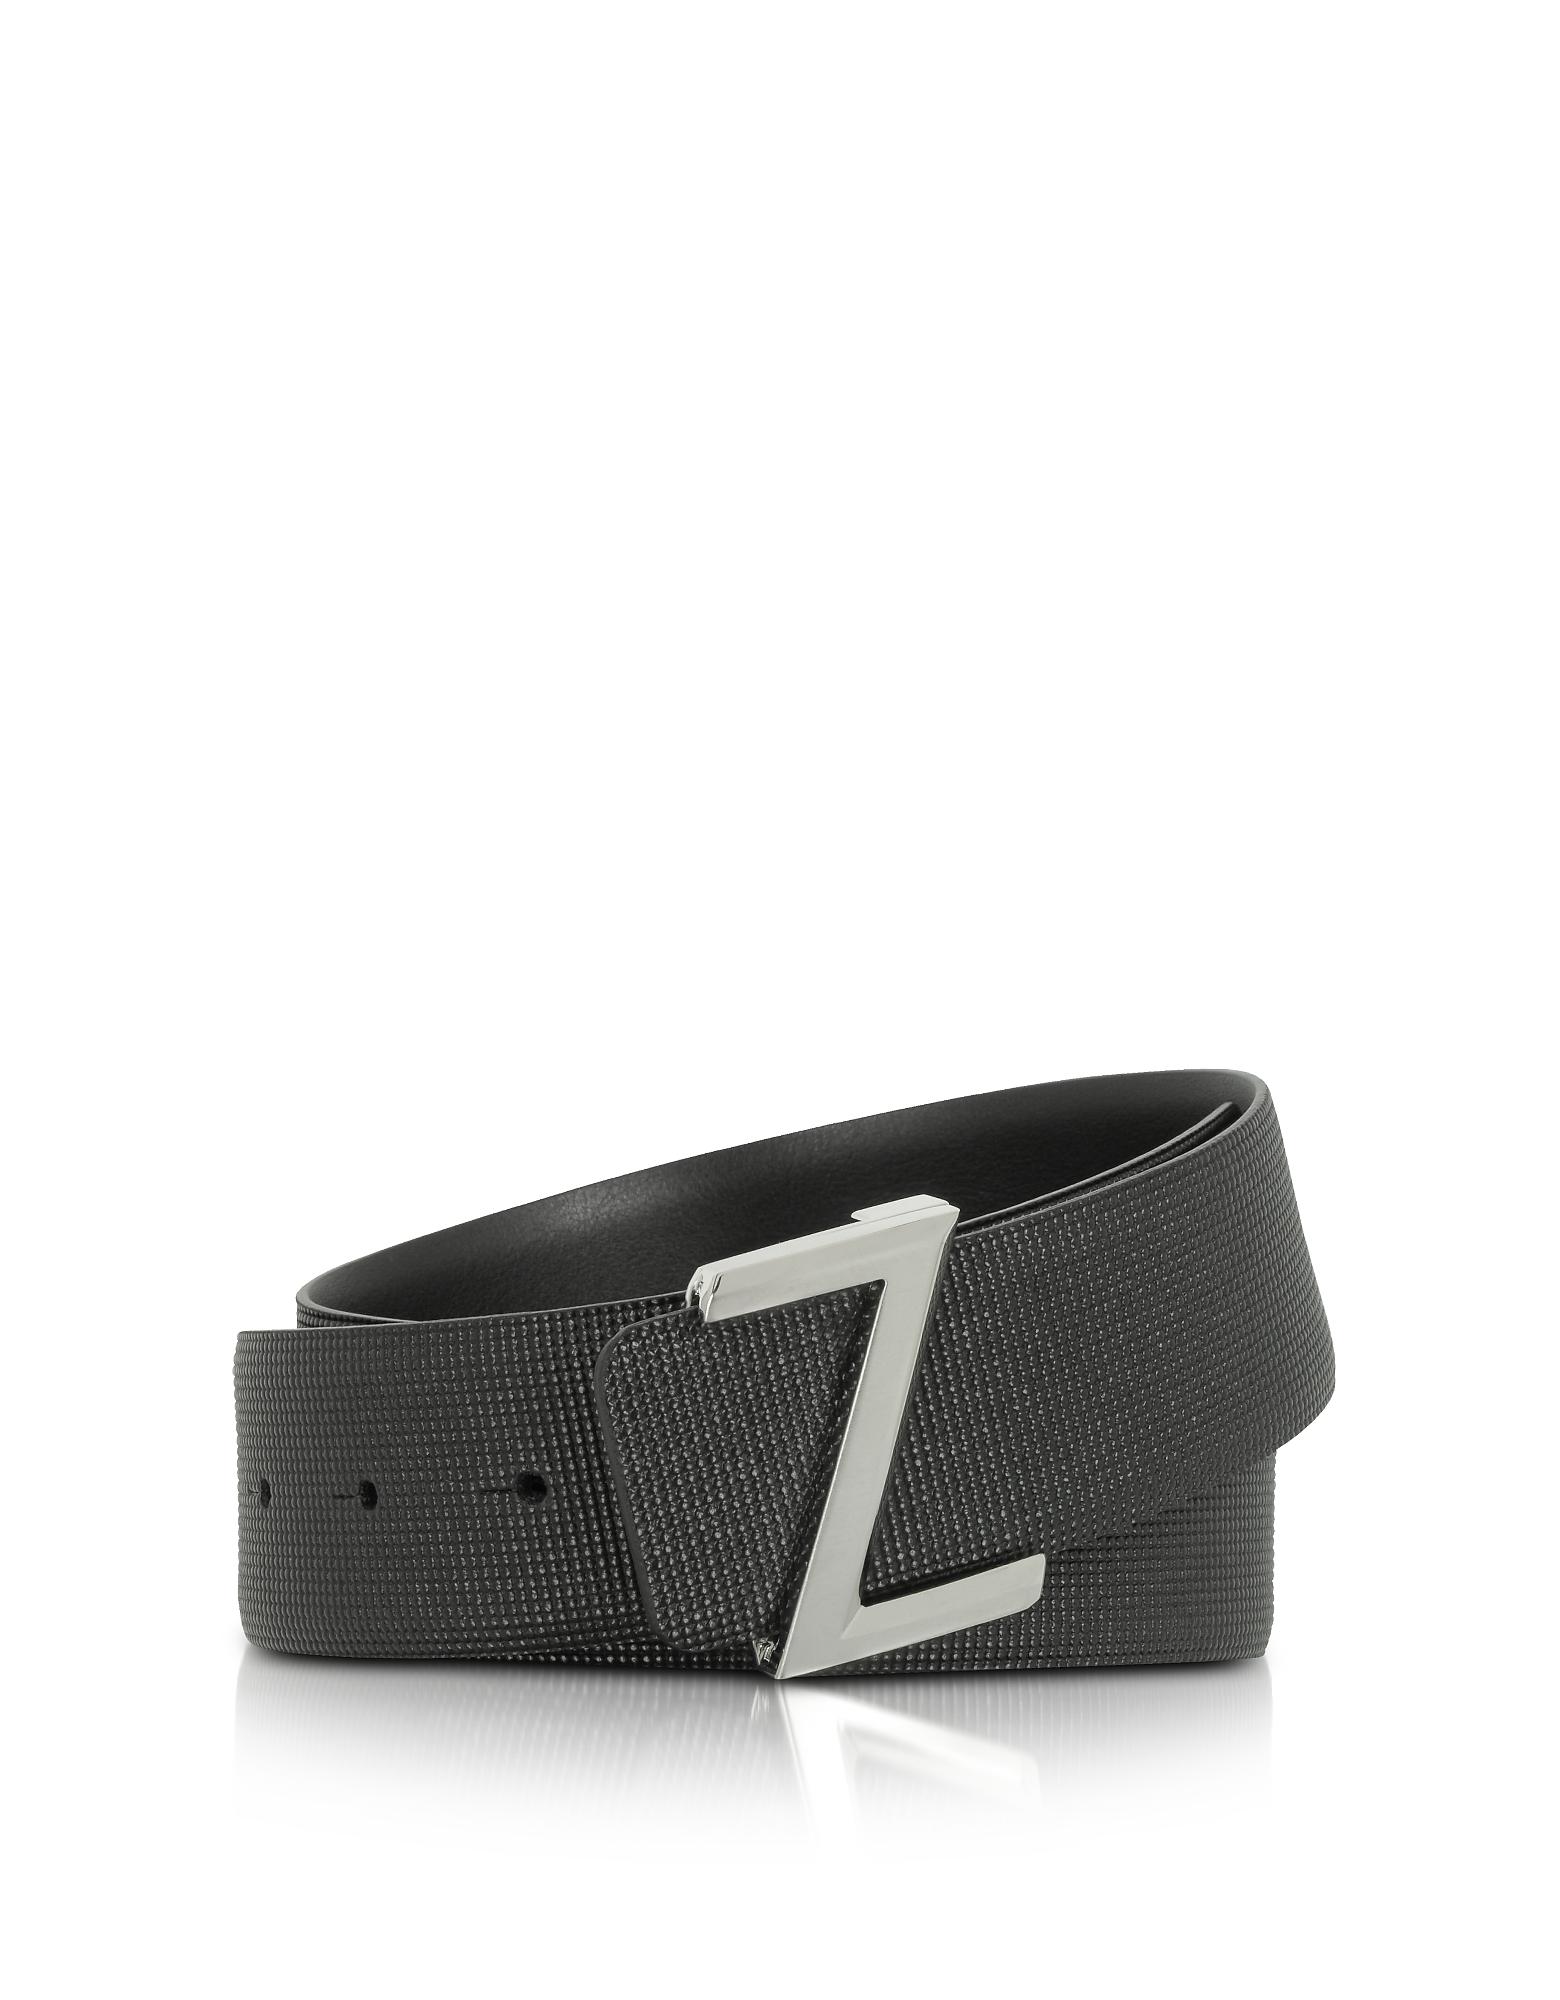 Cintura Logo Slider in Pelle Nera Stampata